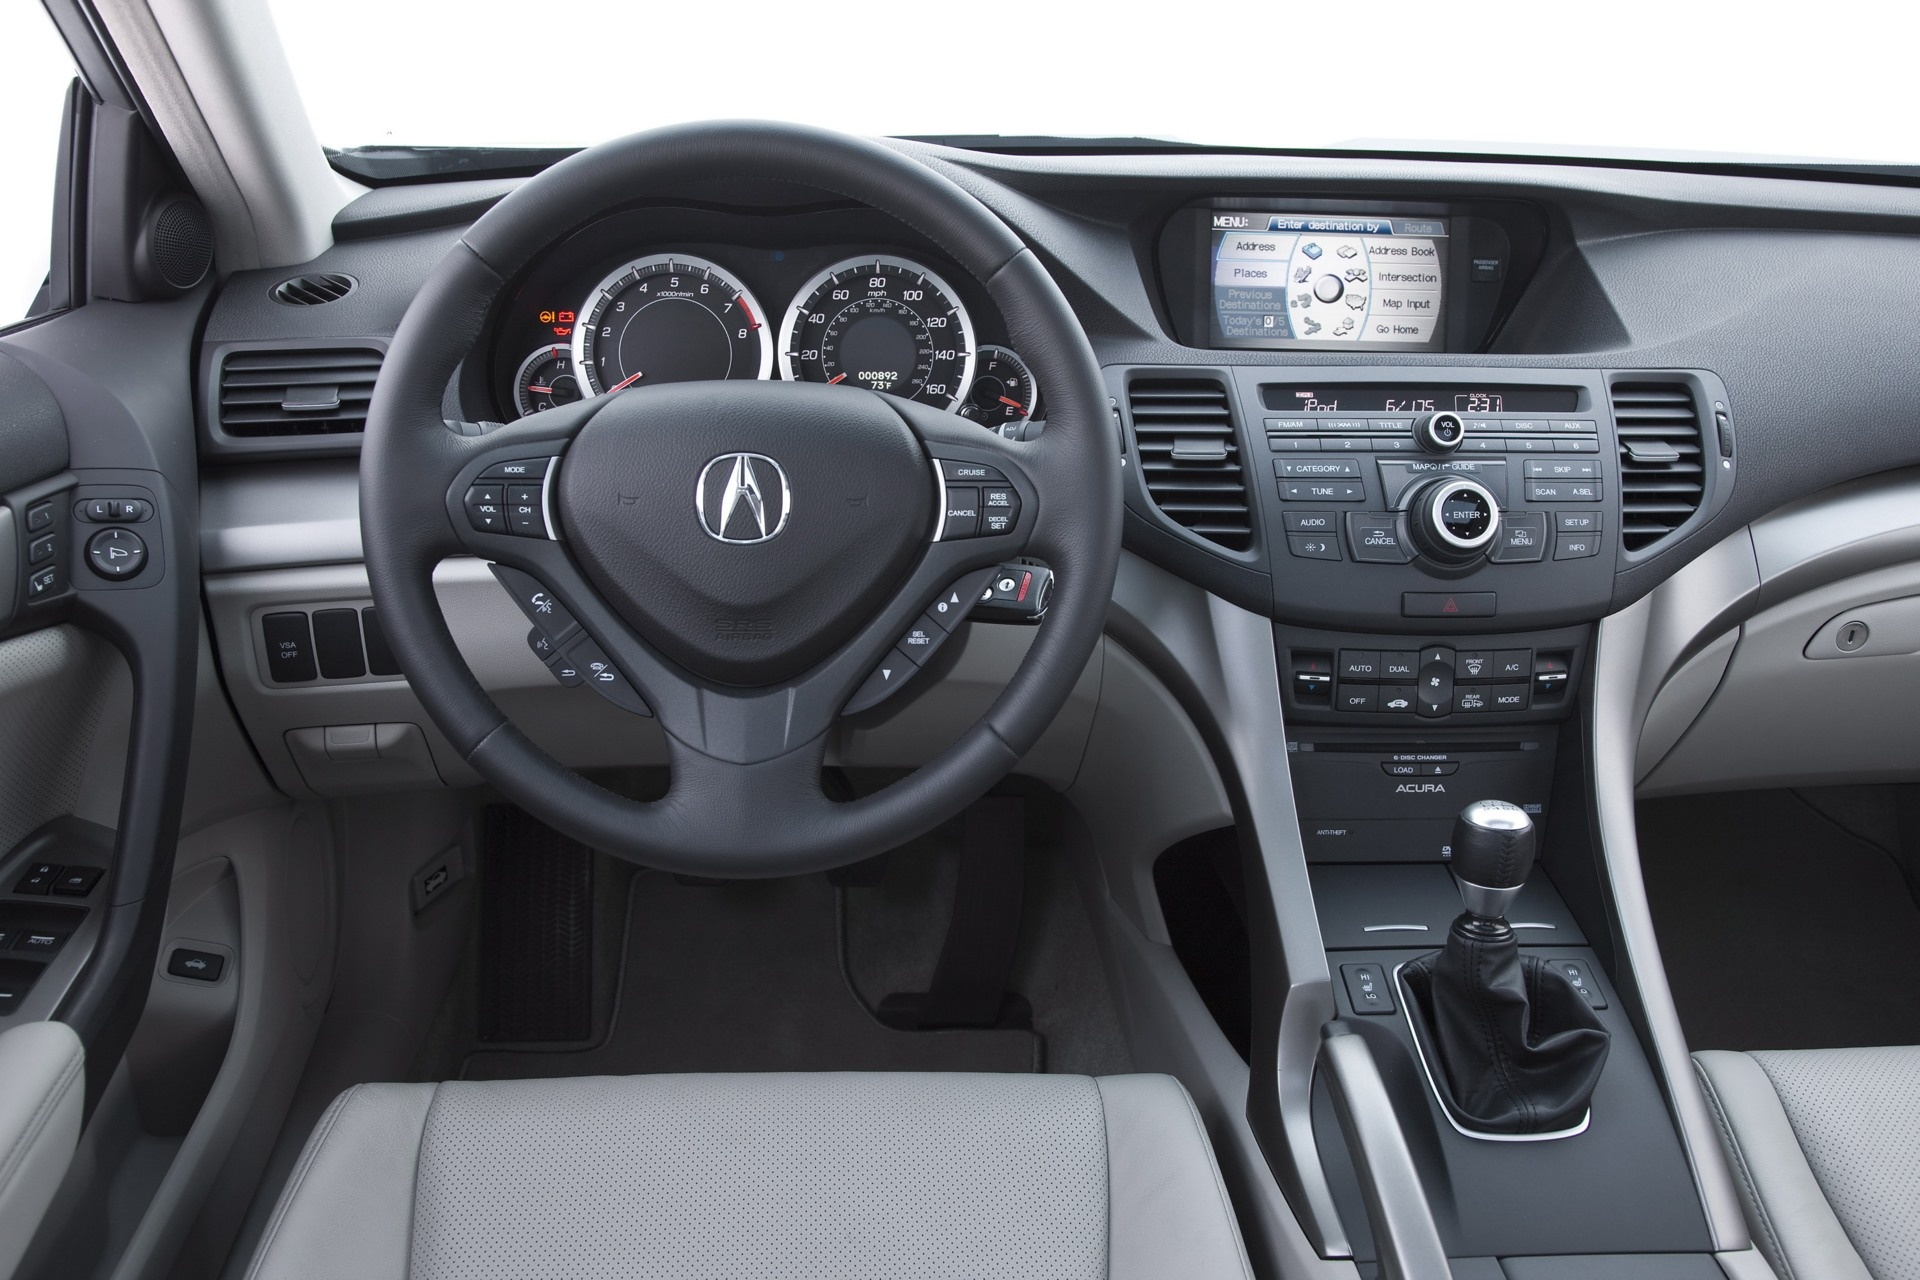 2009 acura tsx image photo 15 of 82 rh conceptcarz com 2009 acura tsx manual review 2009 acura tsx manual transmission fluid